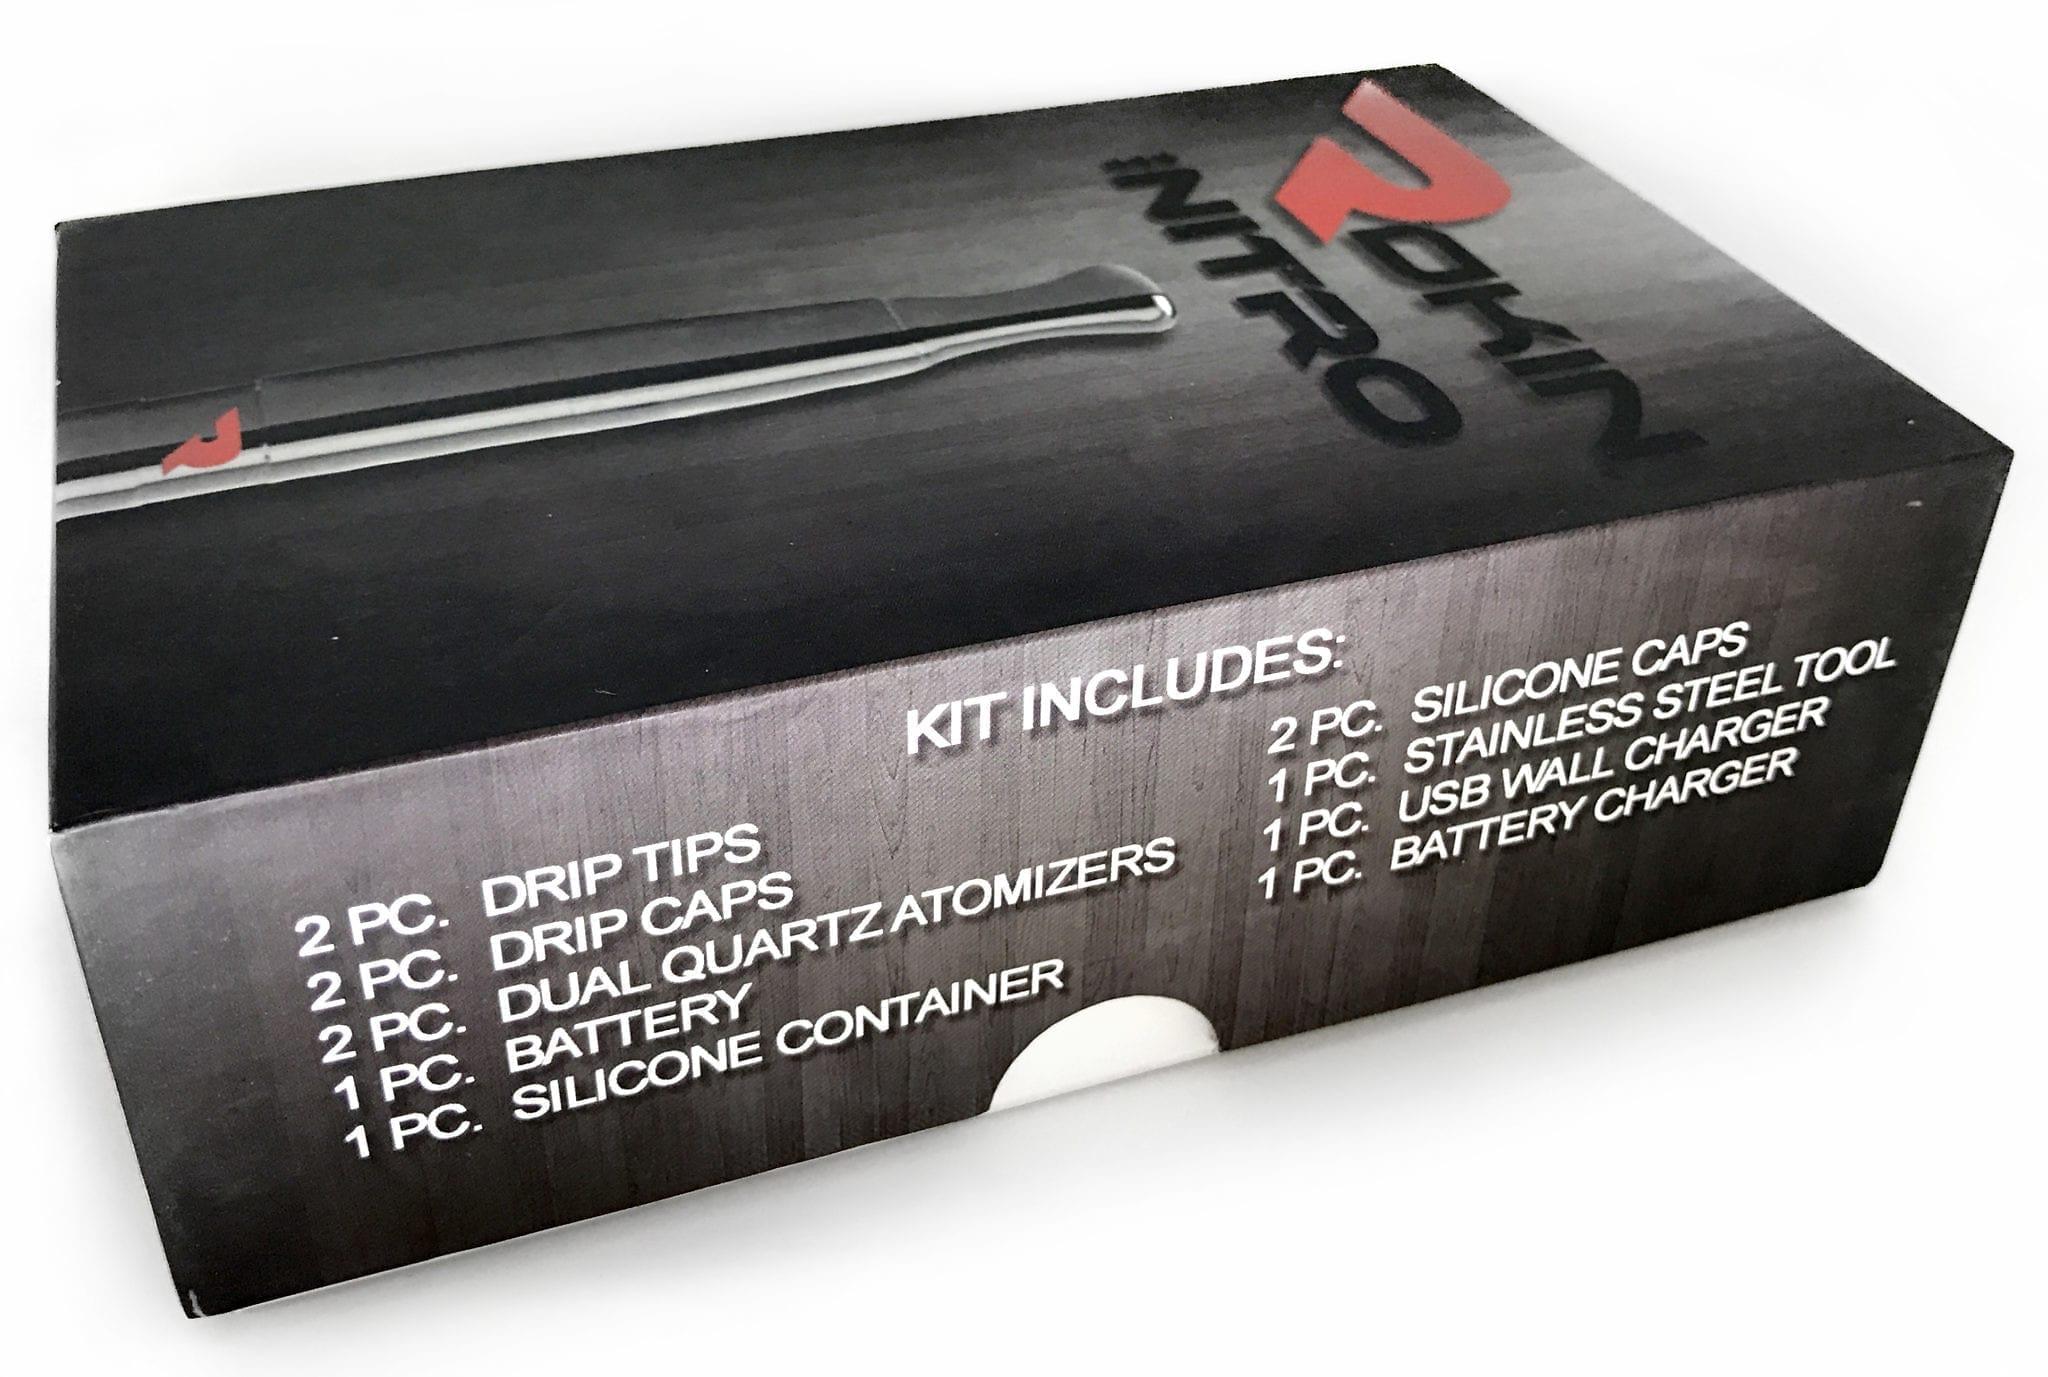 Contents Of The Rokin Nitro Vaporizer Kit